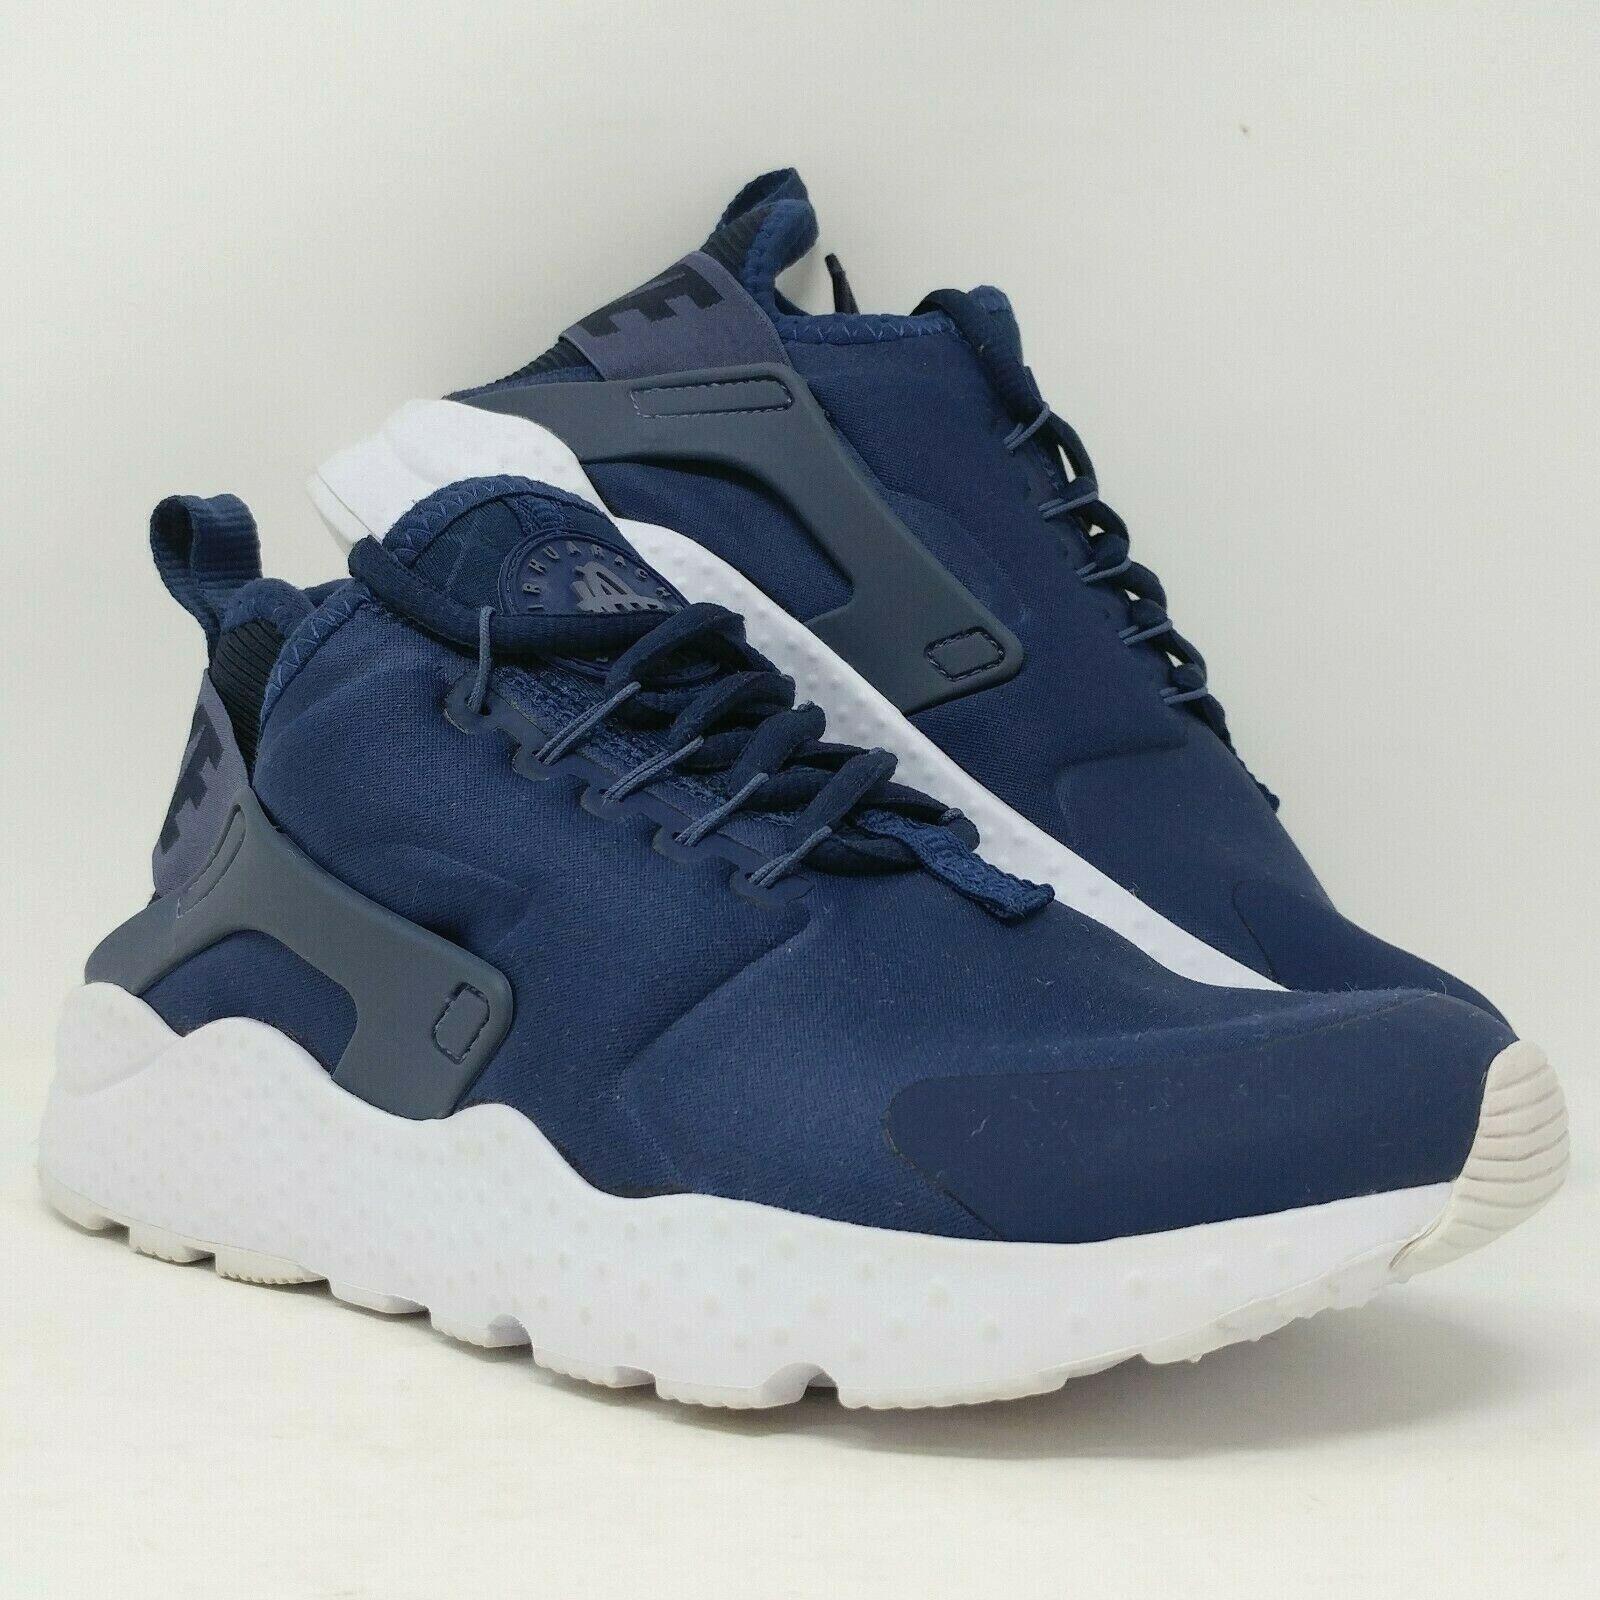 persona fibra pagar  Nike Air Huarache Run Ultra GS Running Shoes Size 6y Navy Blue Pink 847568  401 for sale online | eBay